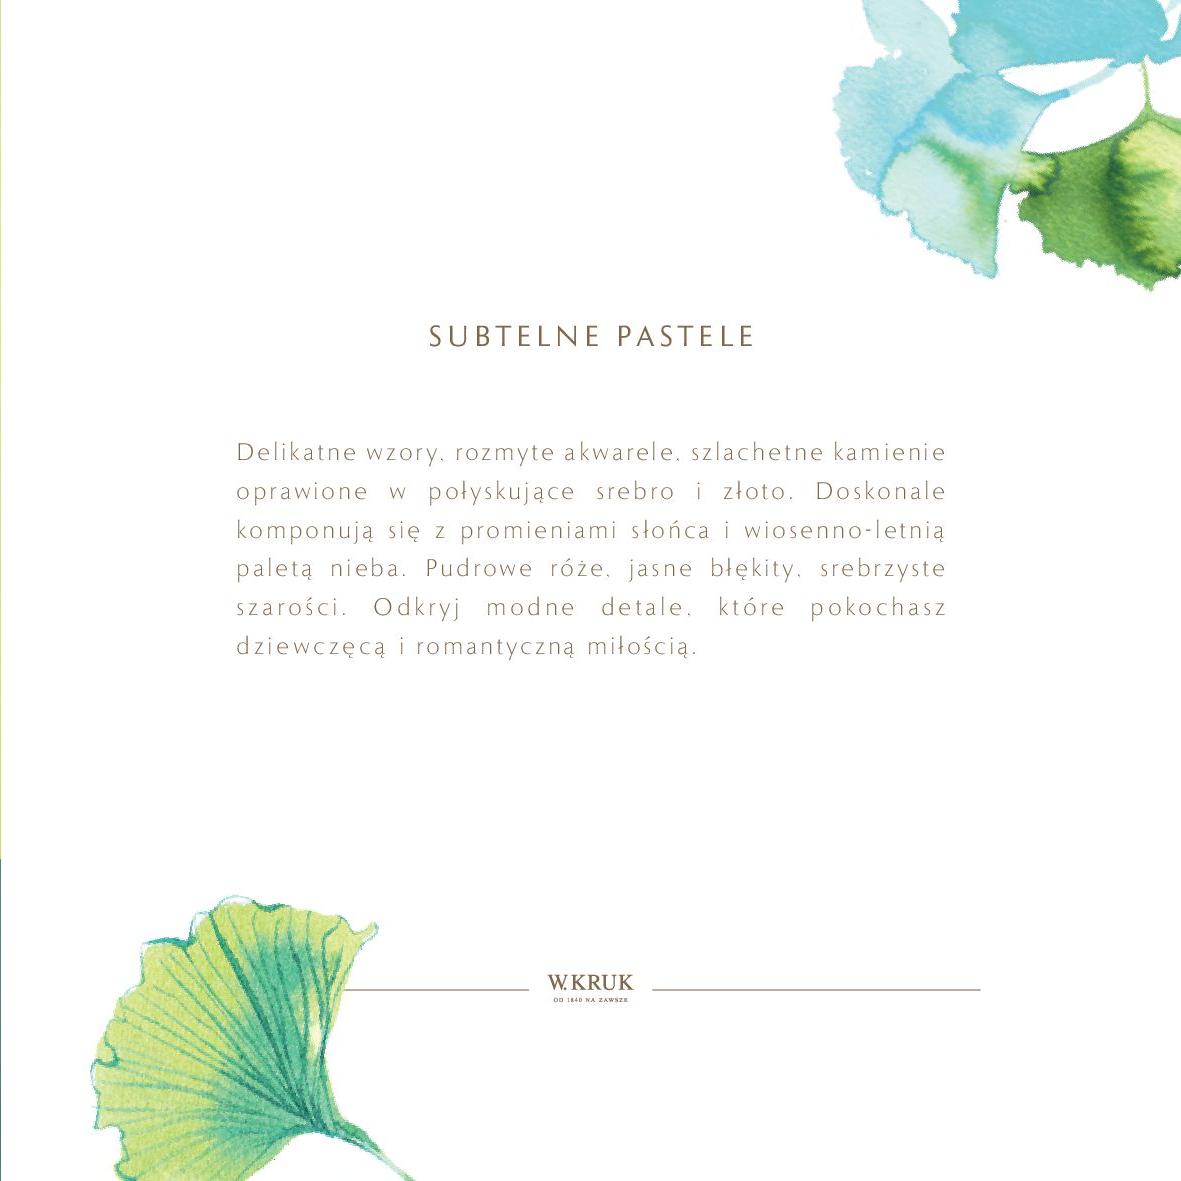 Gazetka W. KRUK: Katalog - Akcesoria 2021-02-17 page-35